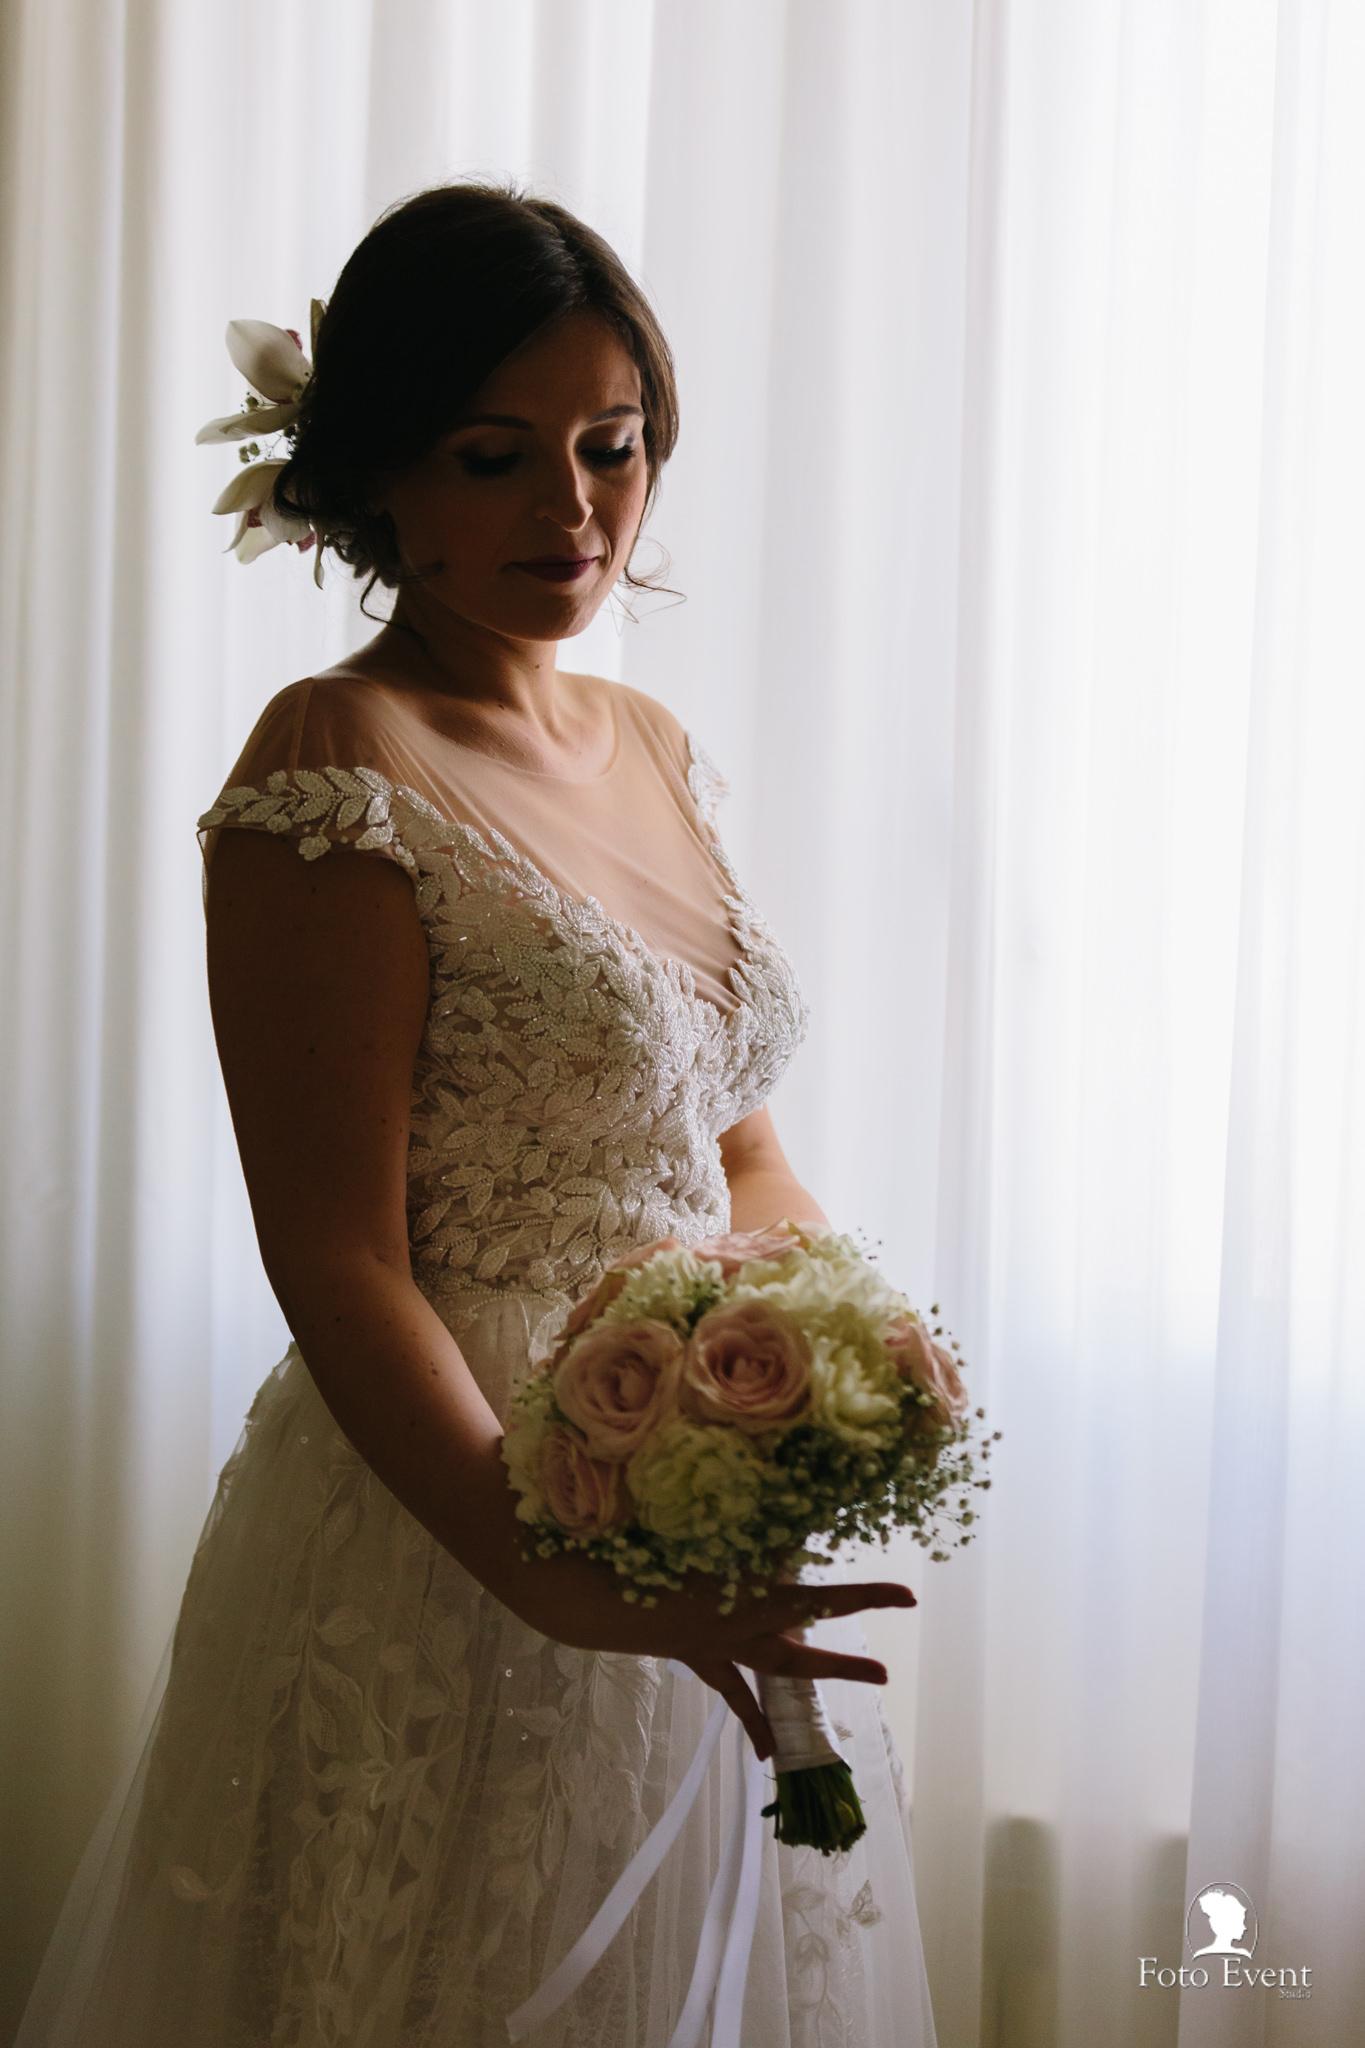 014-2019-09-09-Matrimonio-Dorotea-e-Alberto-Iemmolo-zoom-076